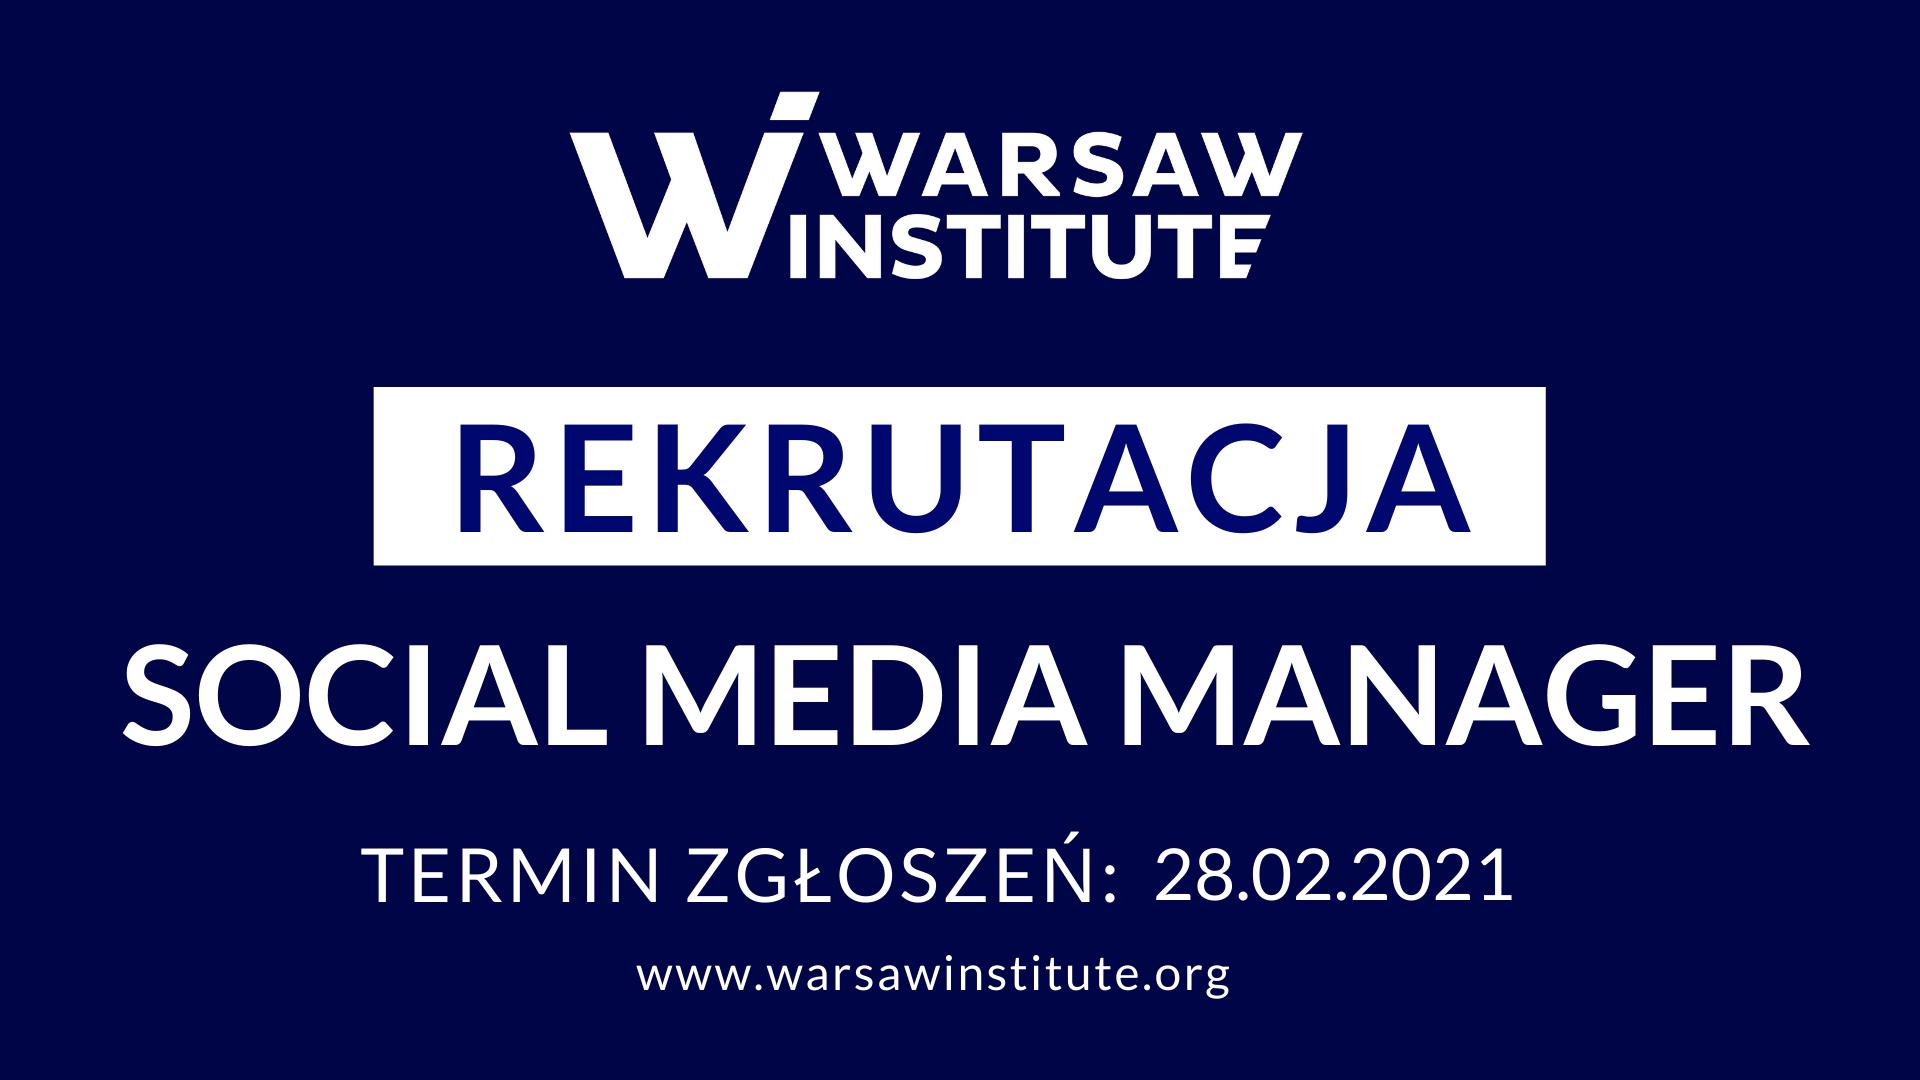 Rekrutacja – Social Media Manager